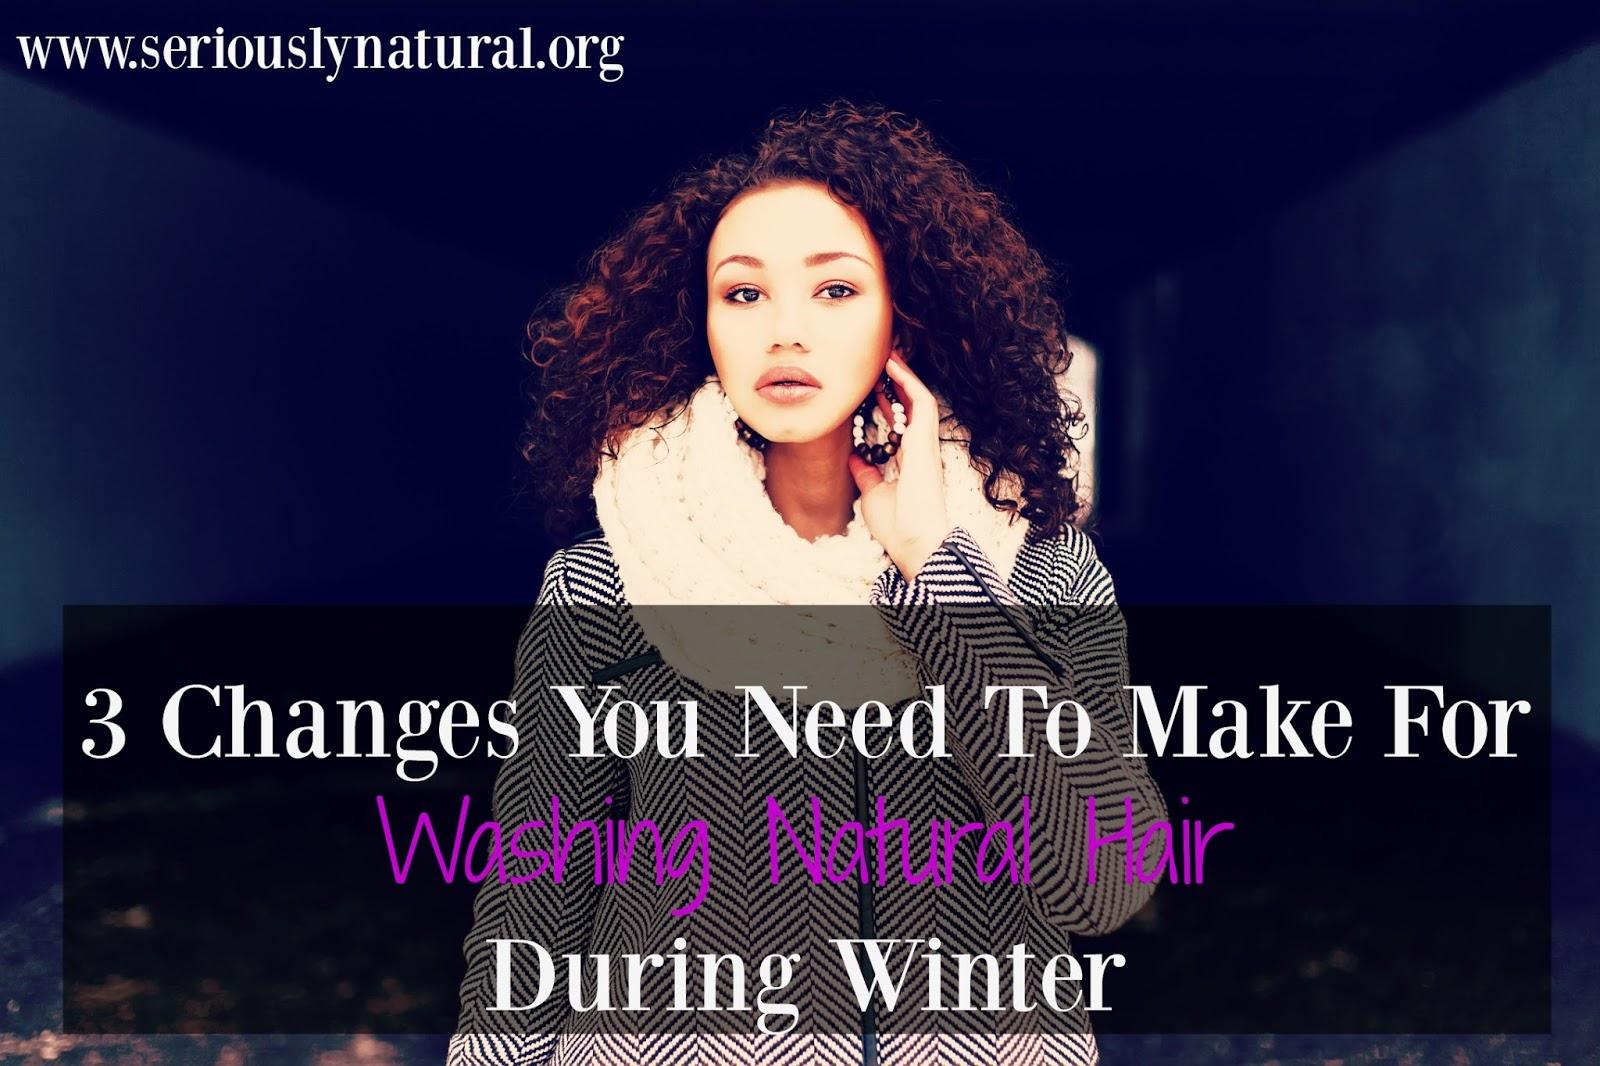 Washing Natural Hair During Winter